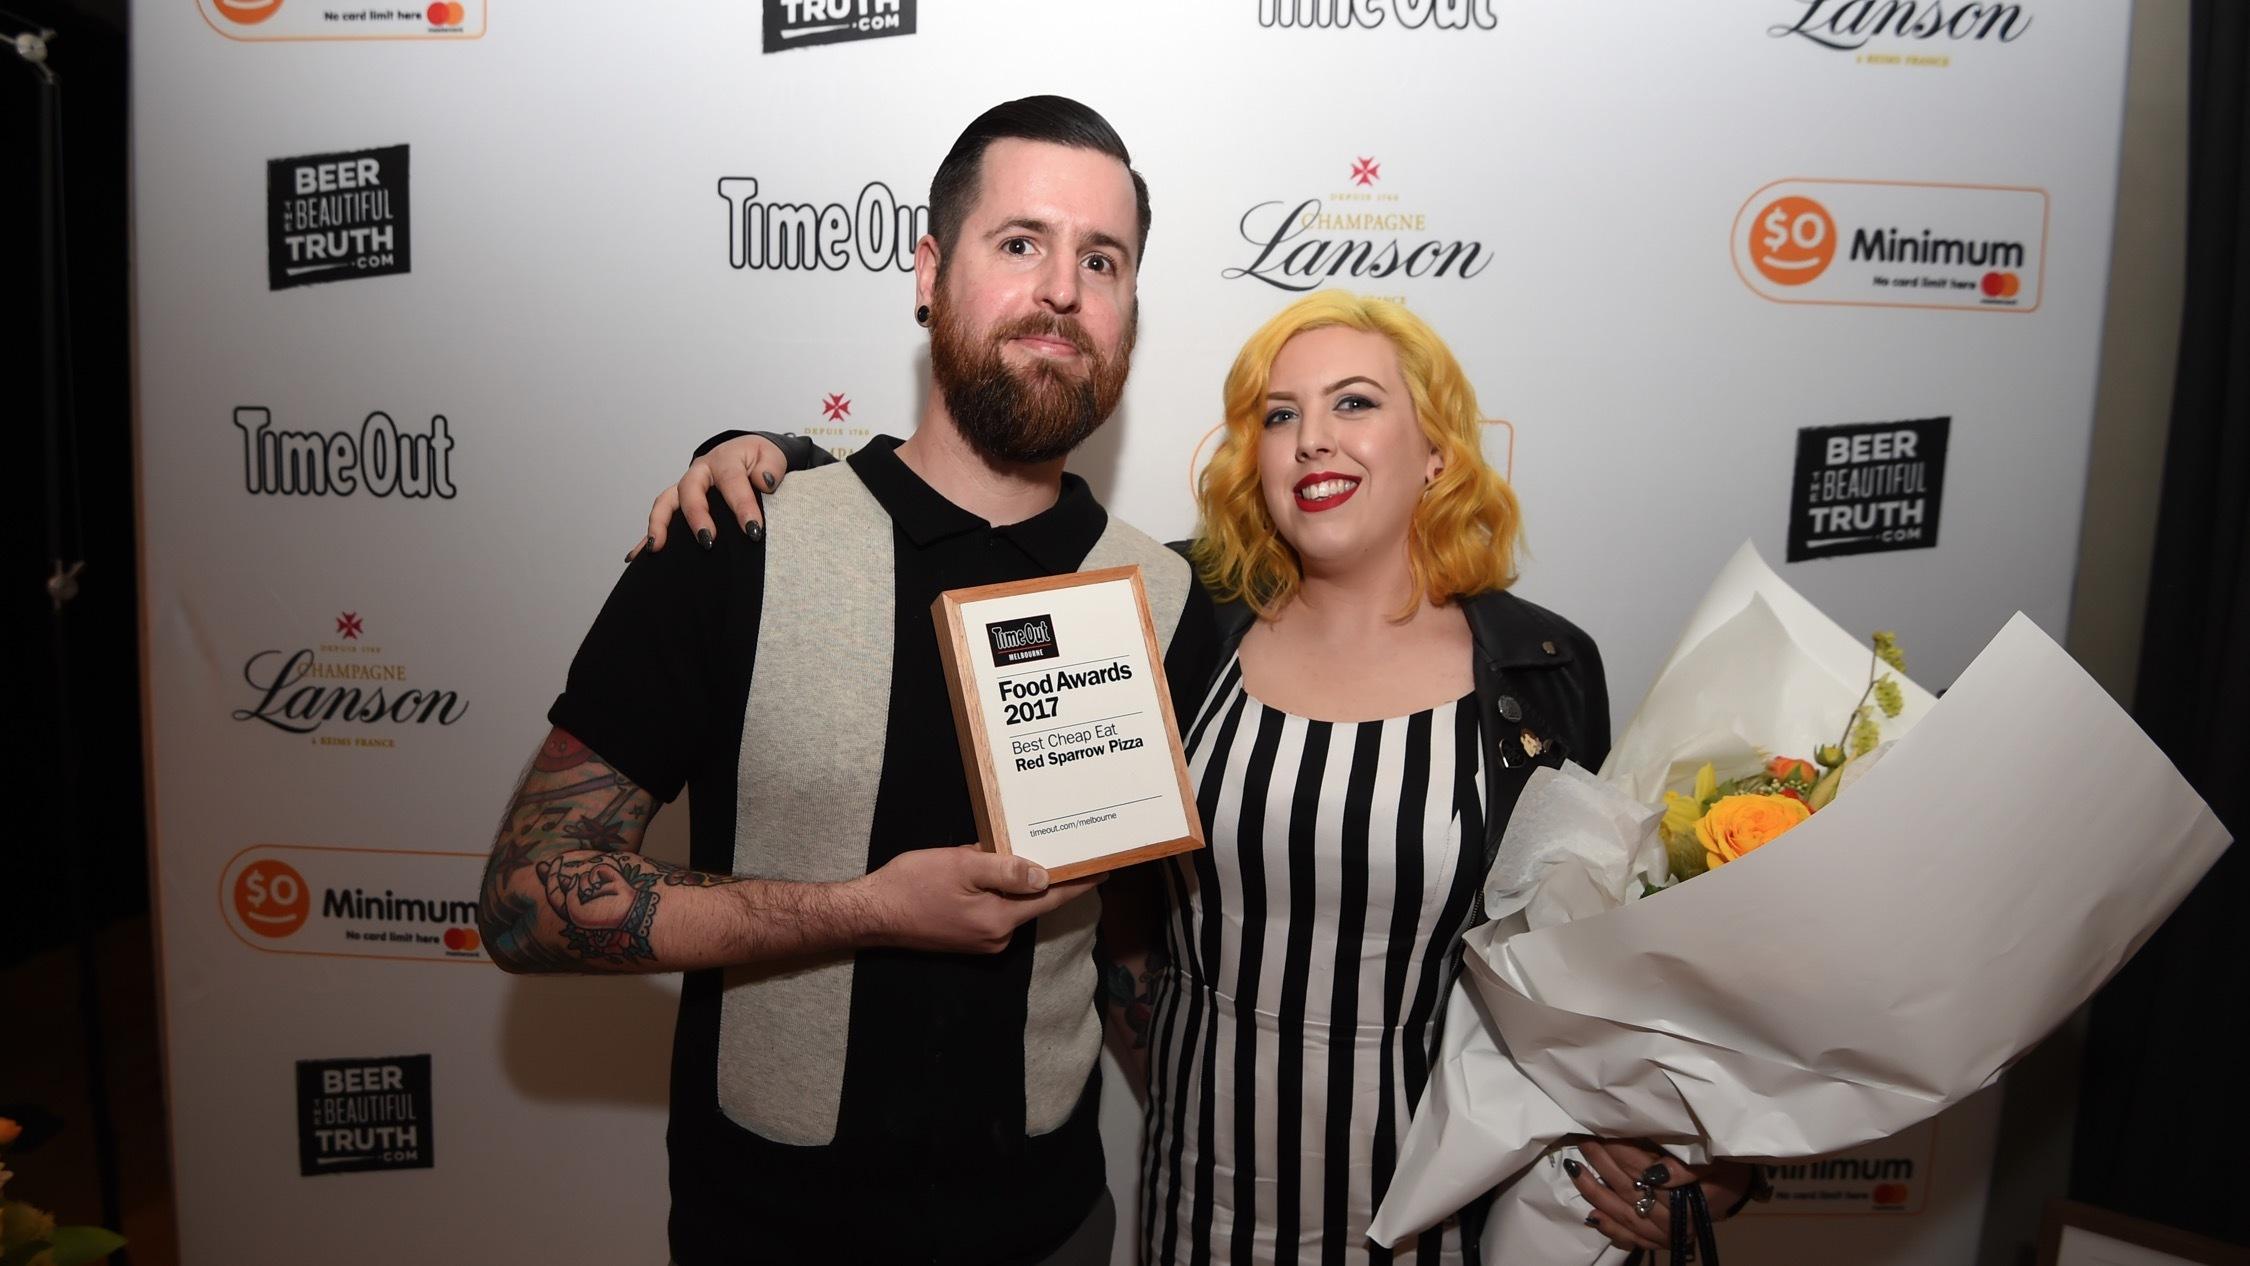 2017 Time Out Food Awards at Pontoon St Kilda